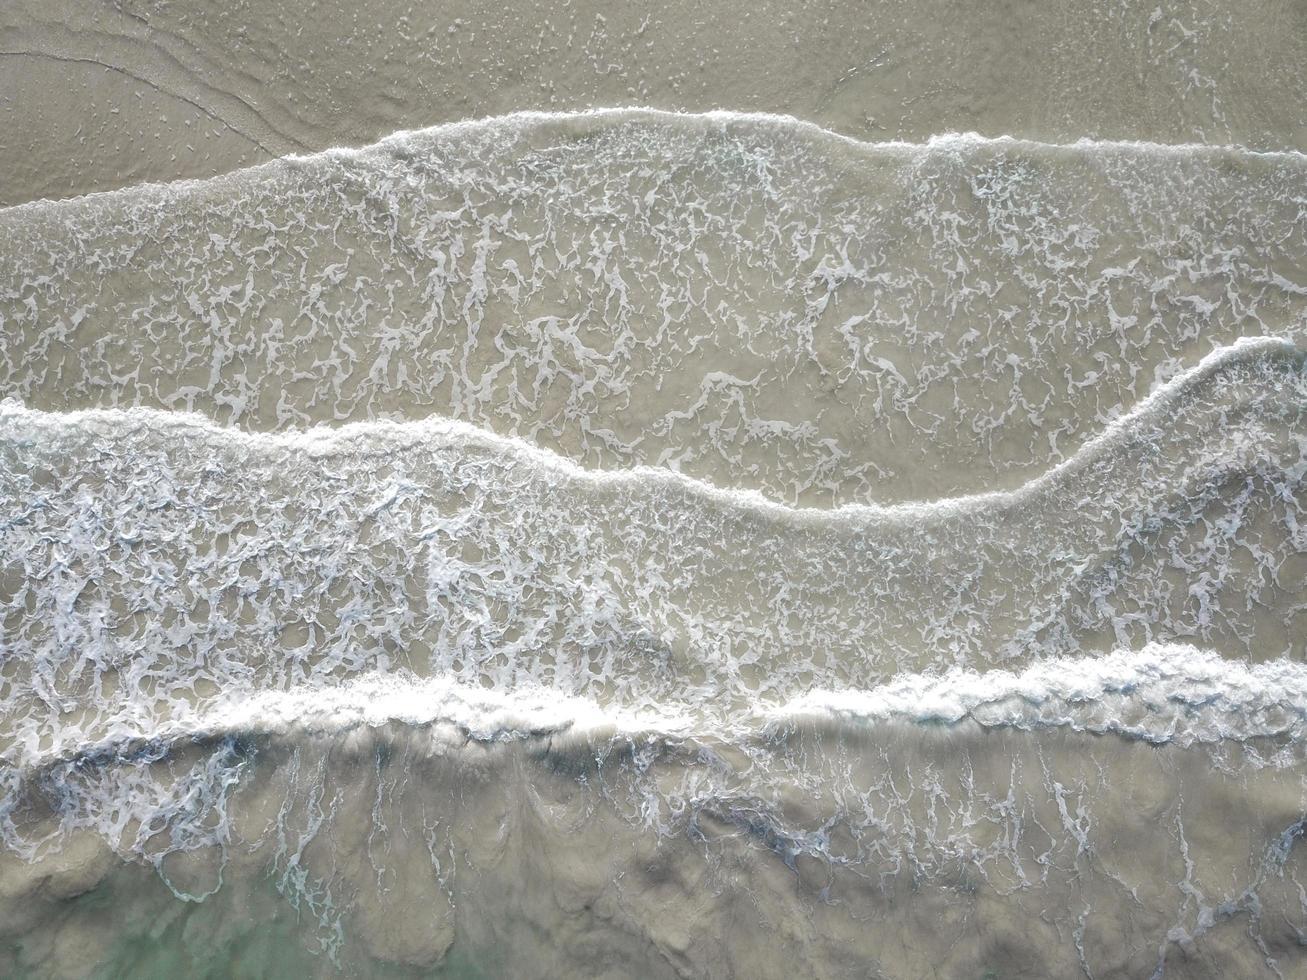 Ocean waves crashing to shore photo